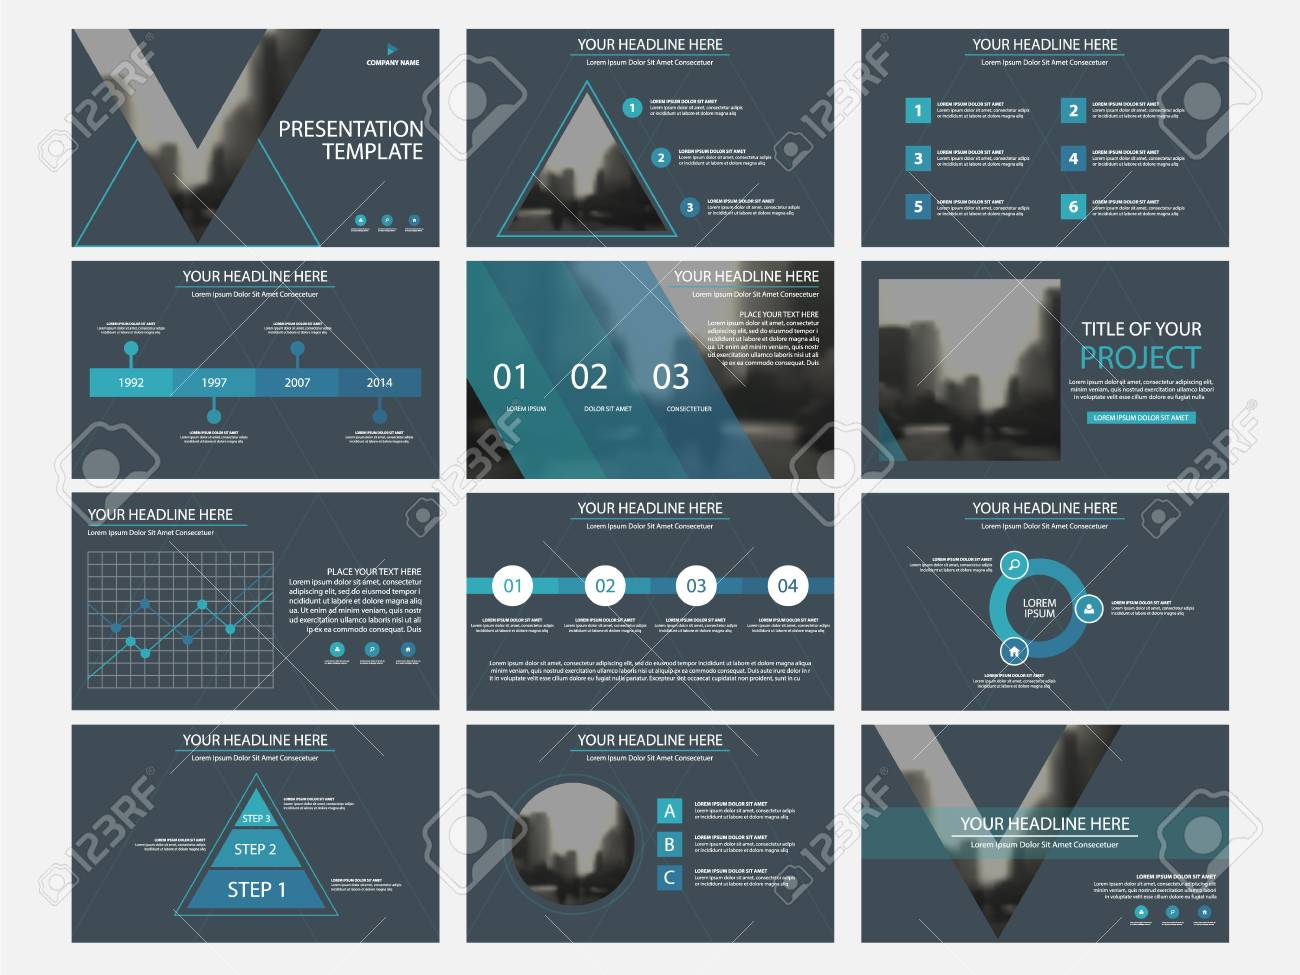 Business presentation infographic elements template set, annual report corporate horizontal brochure design template. - 85215847